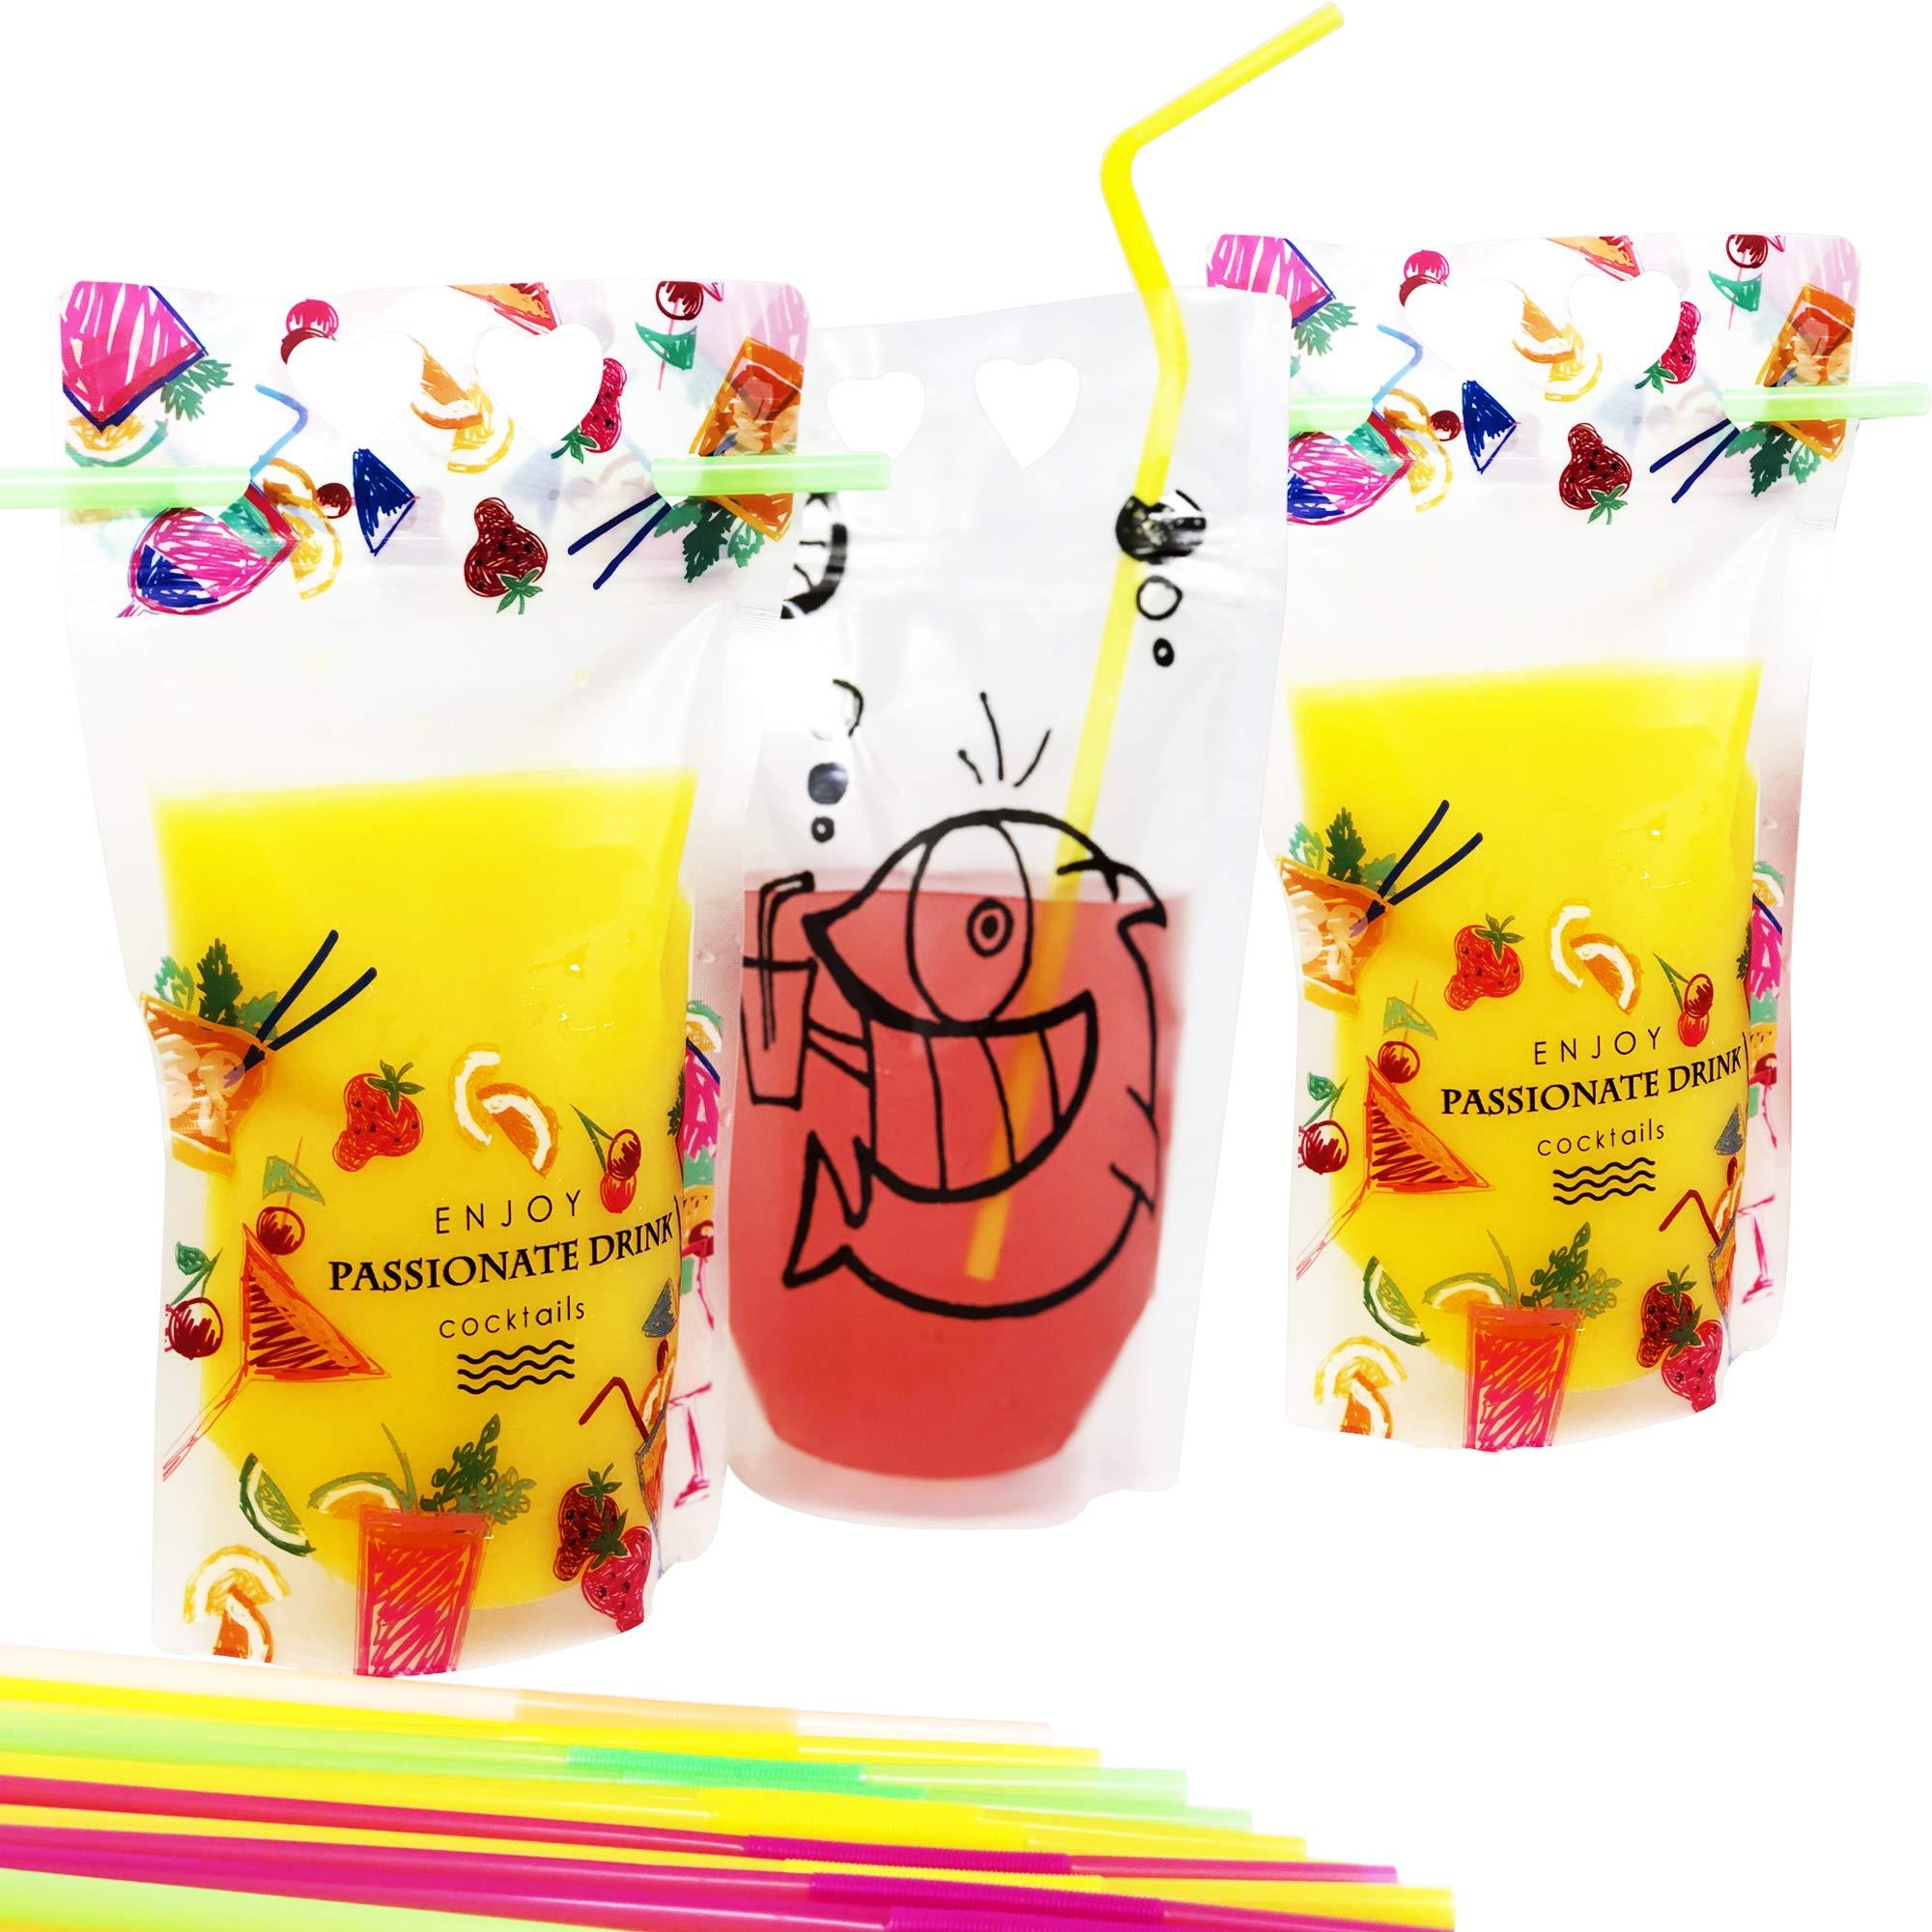 58a93f3dd58d Kamenia 100pcs Reusable Drink Pouches with Straws, Zipper Plastic ...